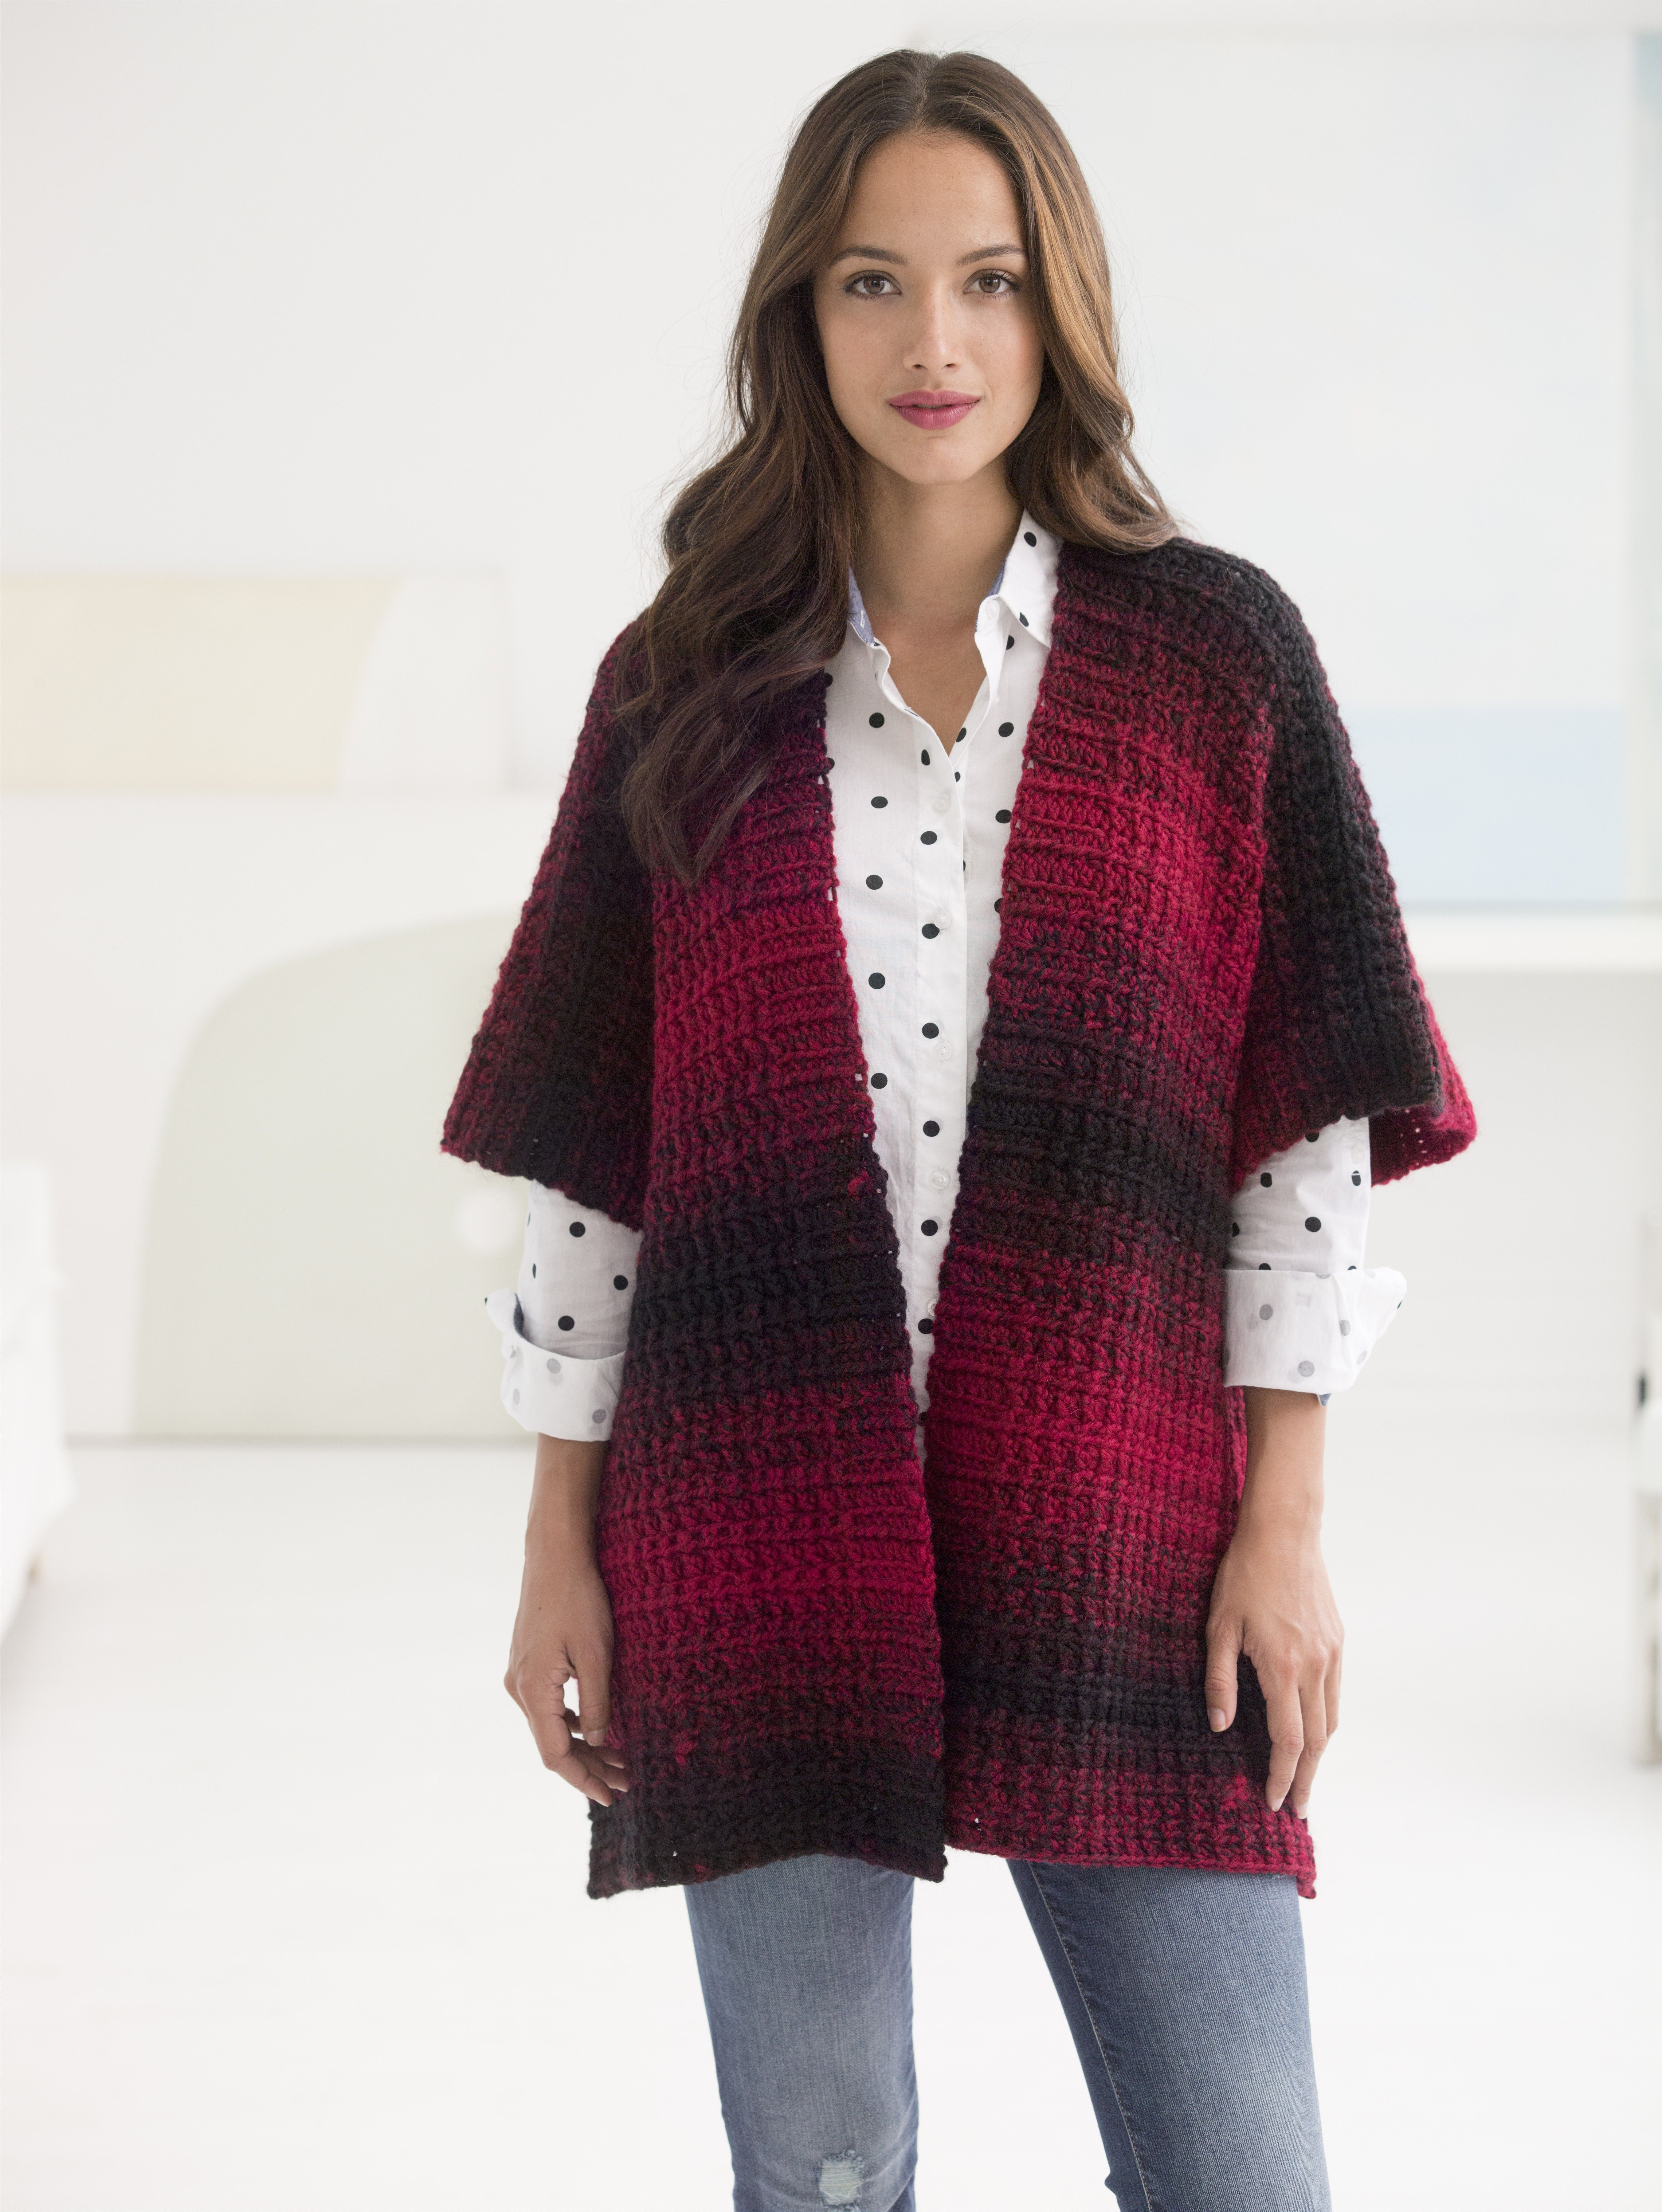 Free Spirit Crochet Topper - Patterns - Lion Brand Yarn | Projects ...